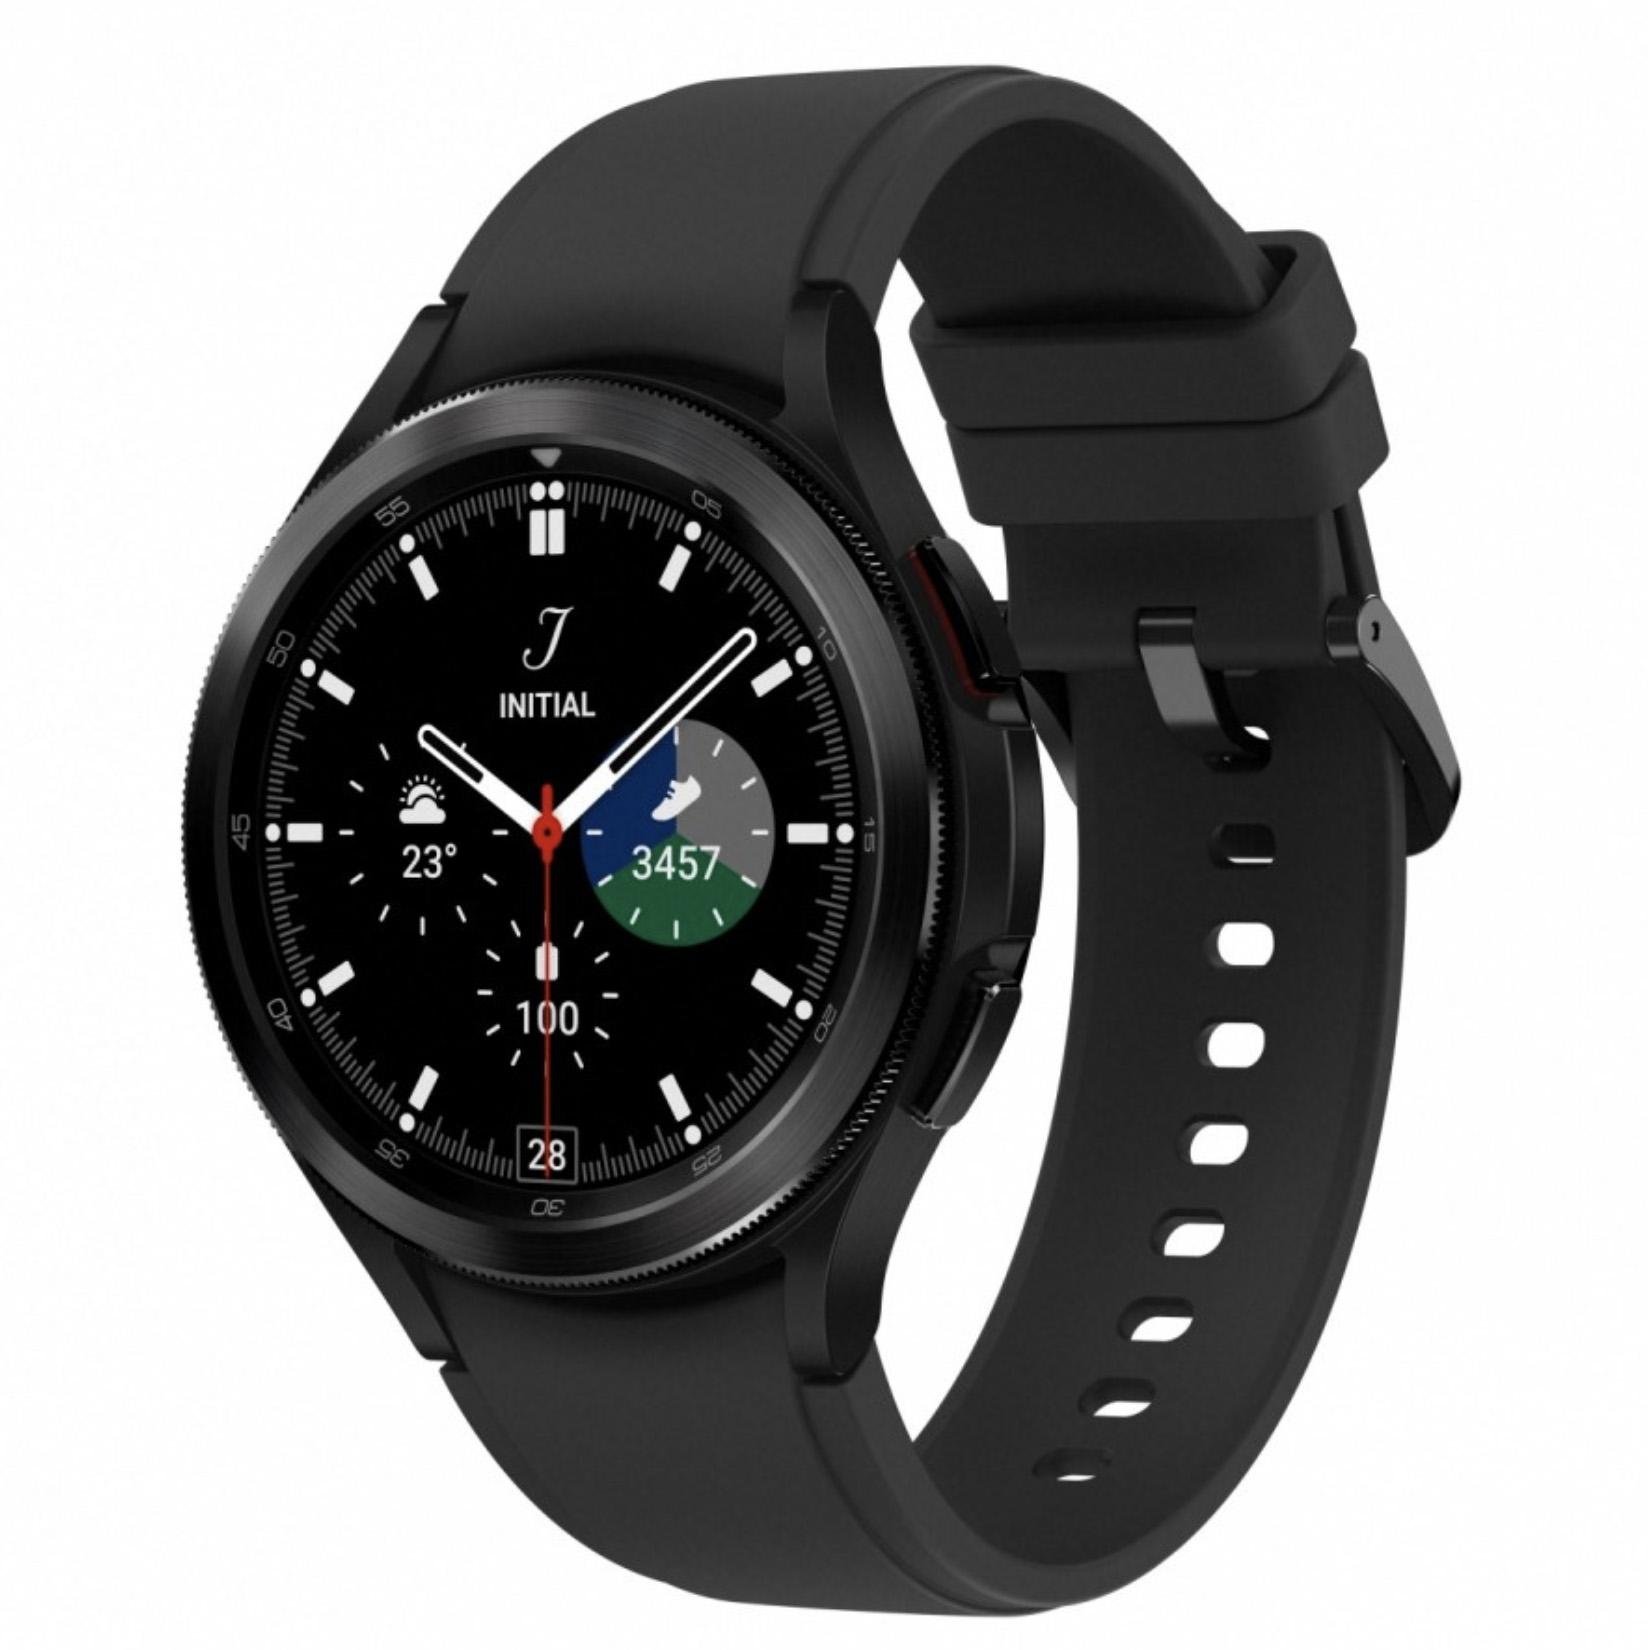 فروش نقدی و اقساطی ساعت هوشمند سامسونگ مدل Galaxy Watch4 Classic 46mm